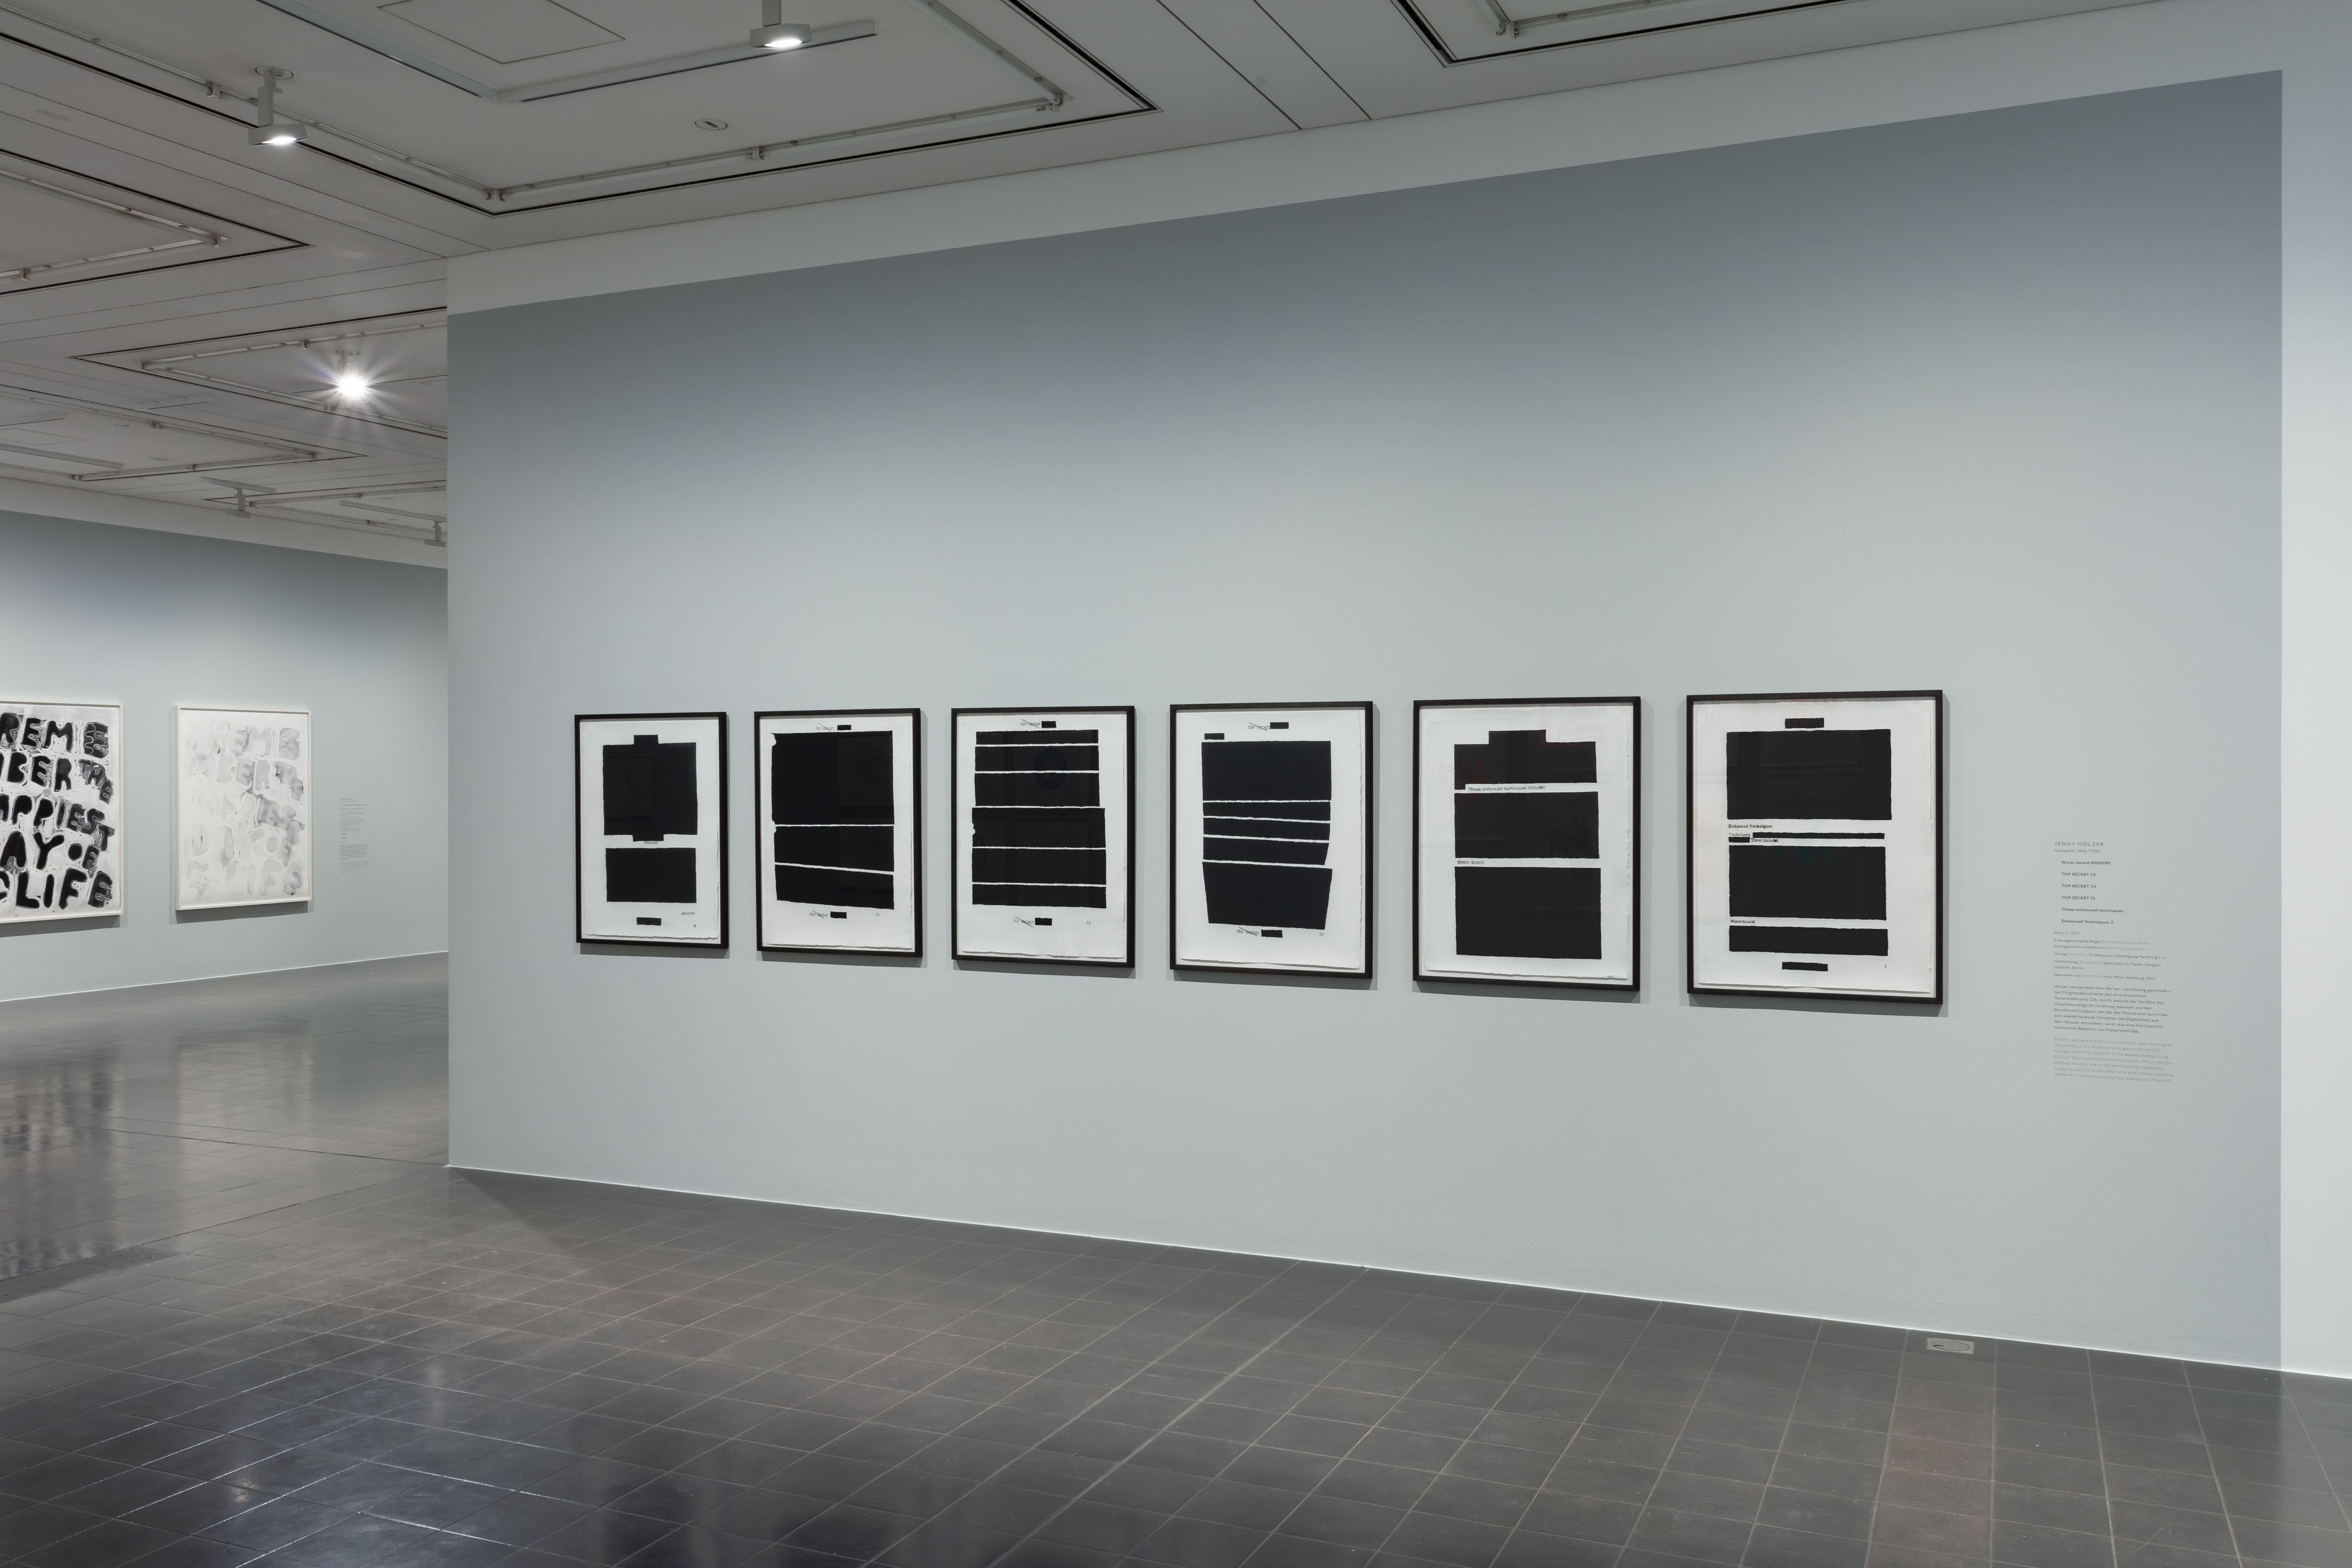 Jenny Holzer (*1950), Werkstatt für Papier, Gangolf Ulbricht, Berlin, Drucker*in, Water board 0000090, Hamburger Kunsthalle Kupferstichkabinett, Foto: Christoph Irrgang© VG Bild-Kunst, Bonn